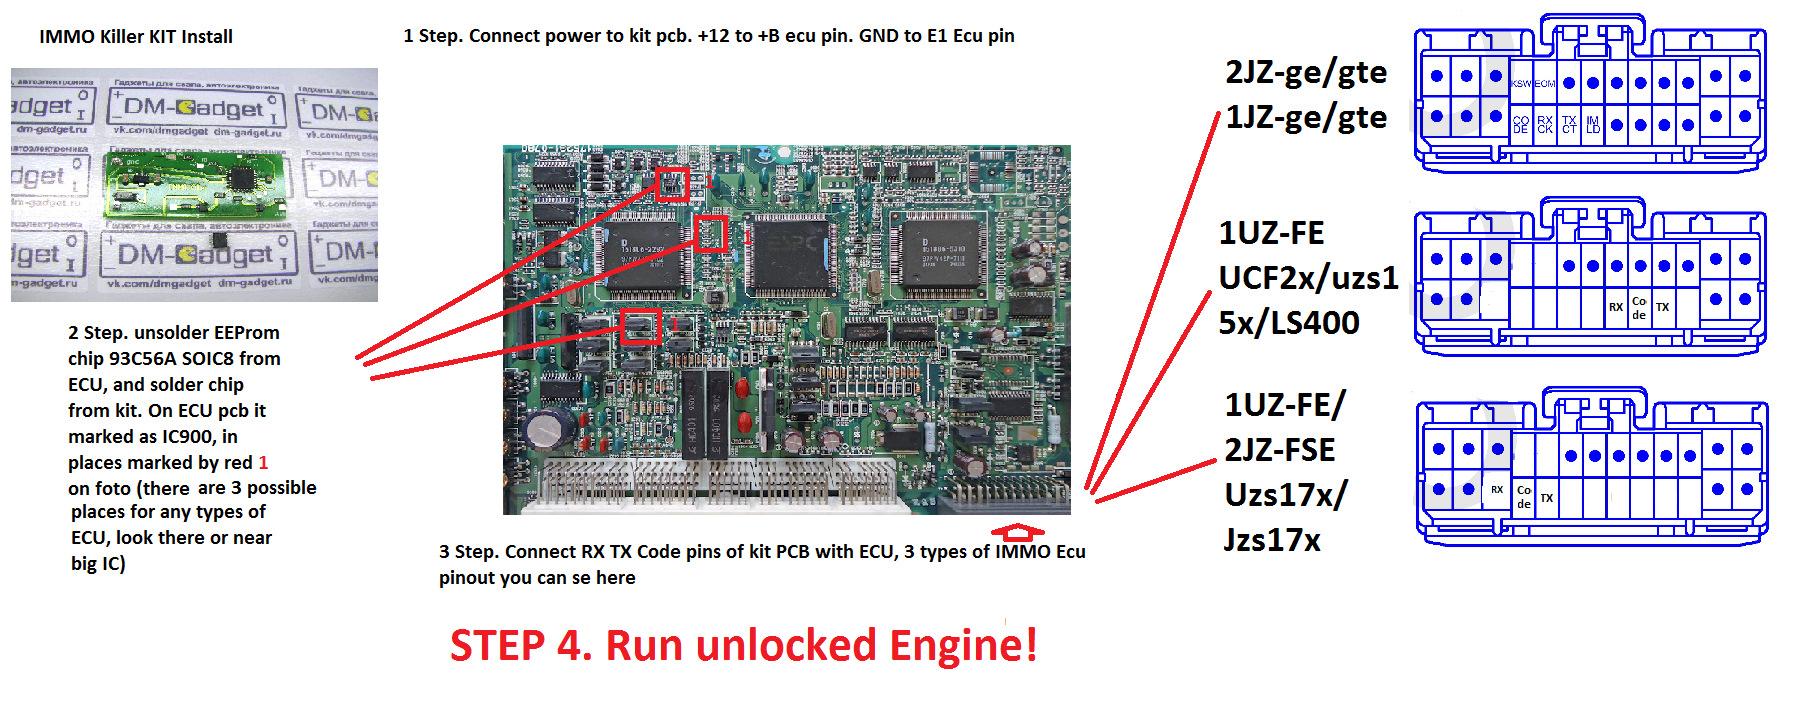 Toyota Supra Ecu Diagram Trusted Wiring Diagrams 2jz Pinout For The Fse Engine 94 Honda Civic Radio